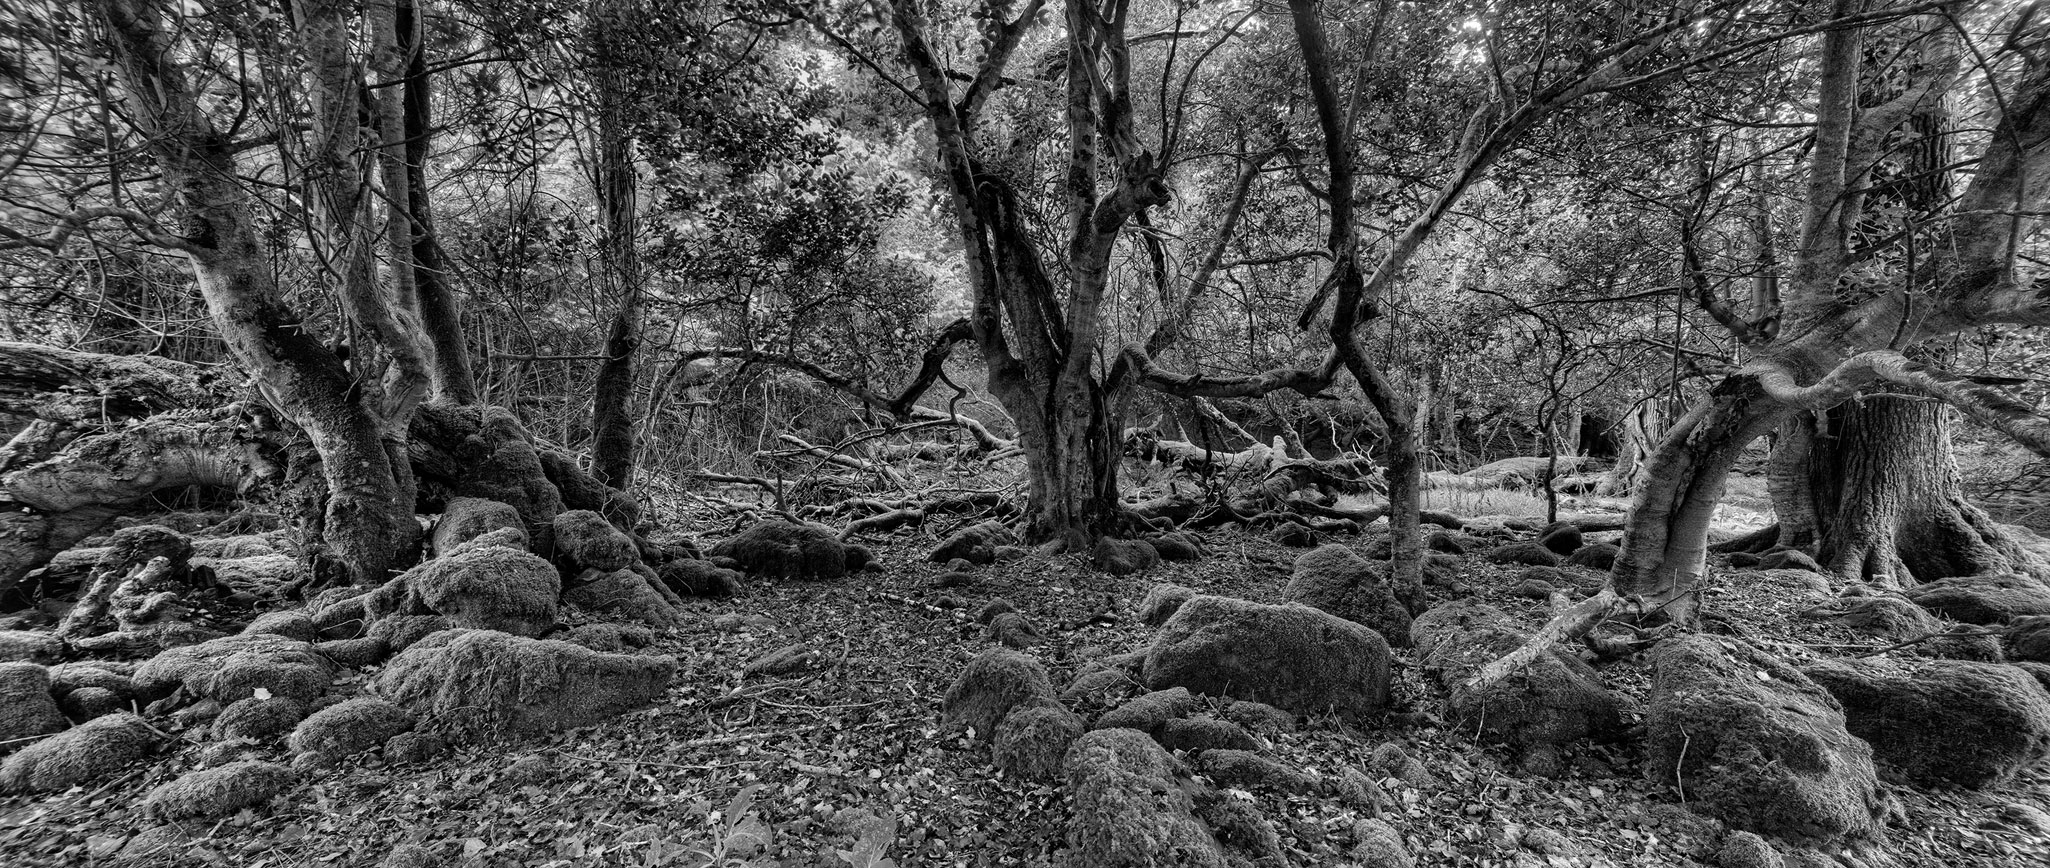 irish forest photo Tomies Wood kerry